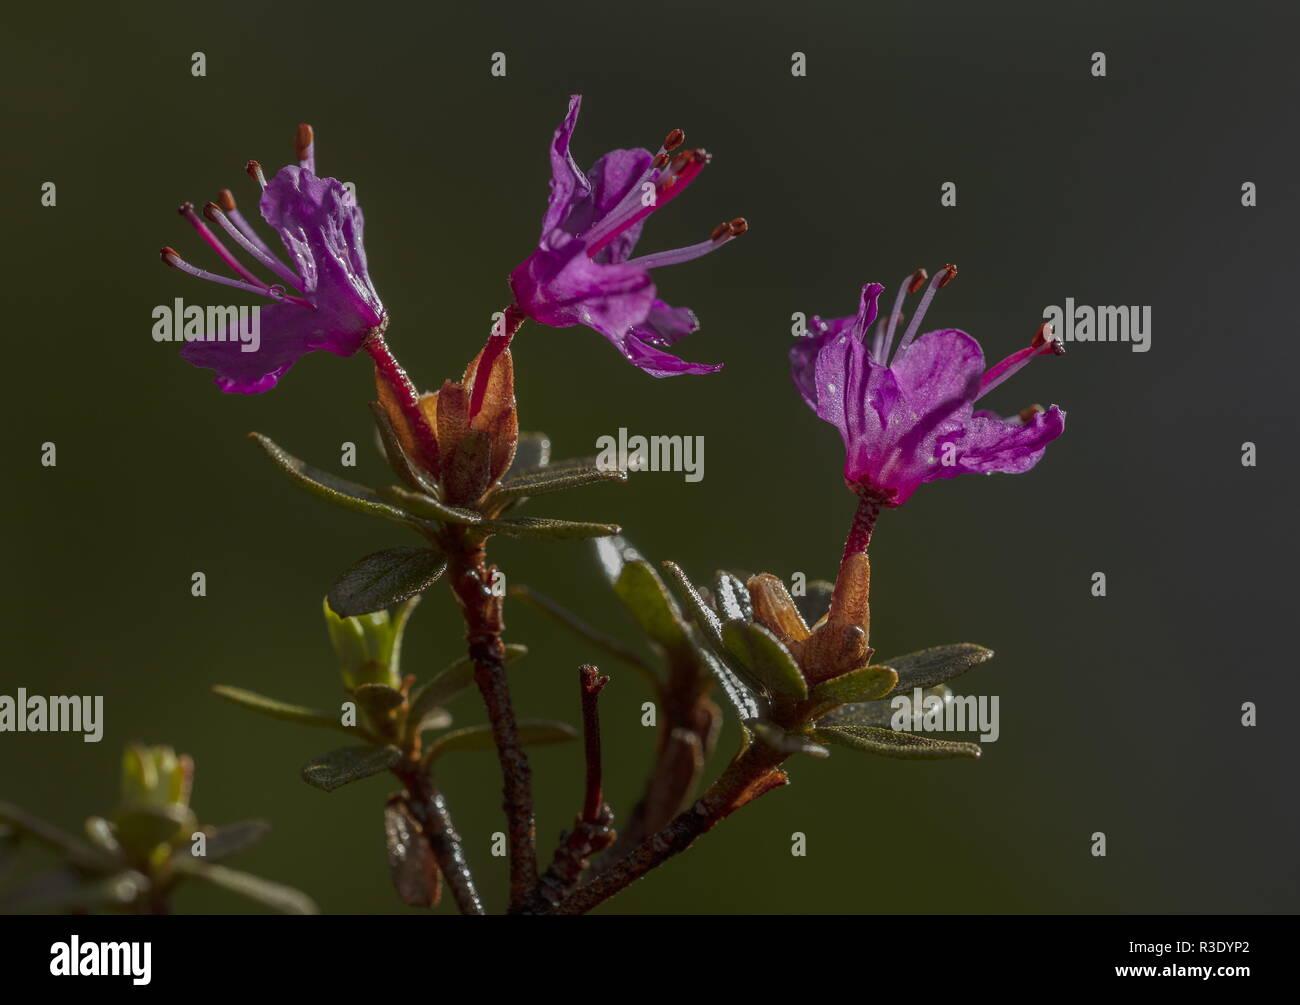 Lapland Rhododendron, Rhododendron lapponicum in flower in spring; Abisko, arctic Sweden. - Stock Image